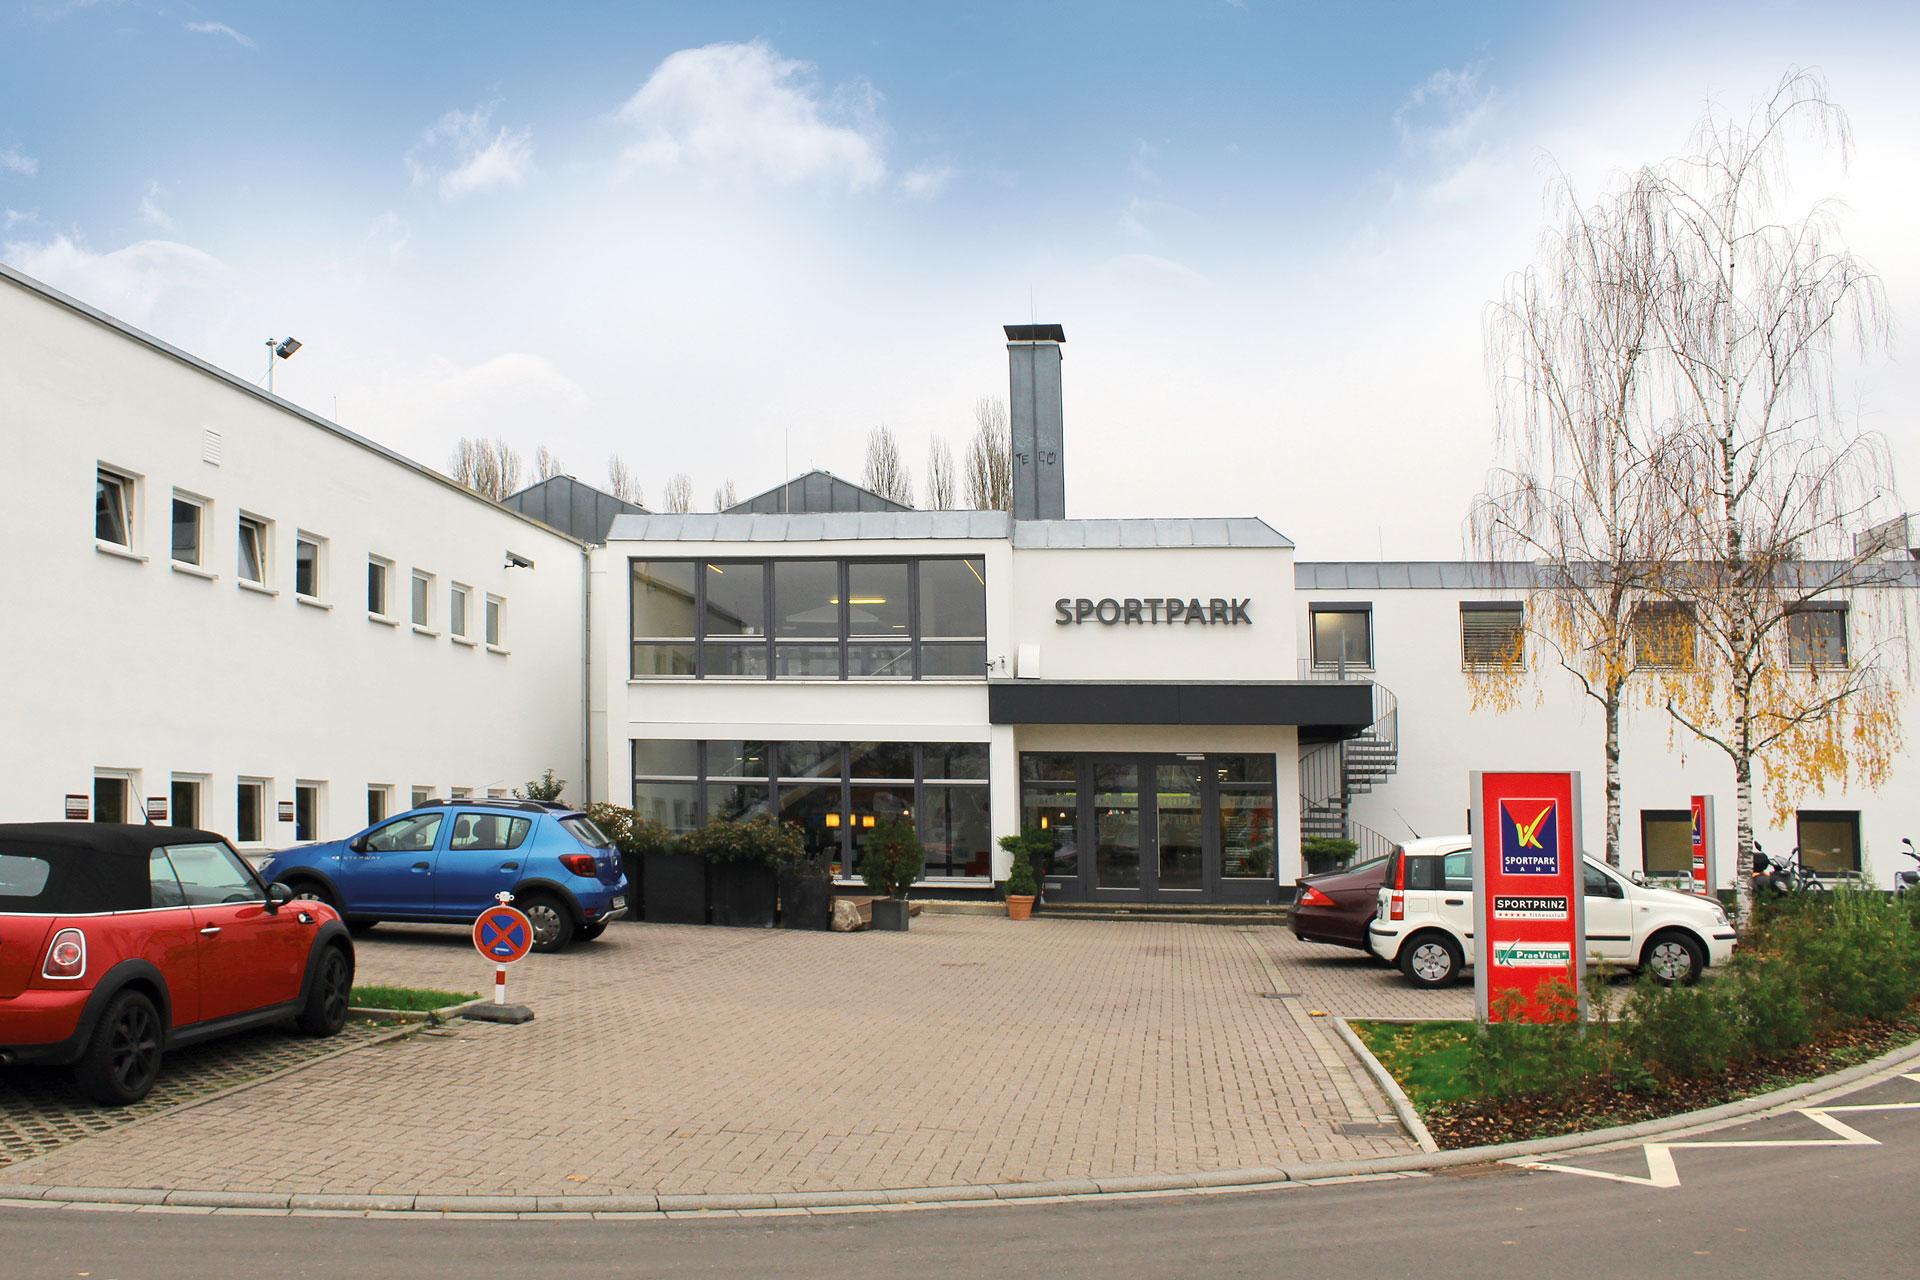 sportpark-lahr-1920x1280px